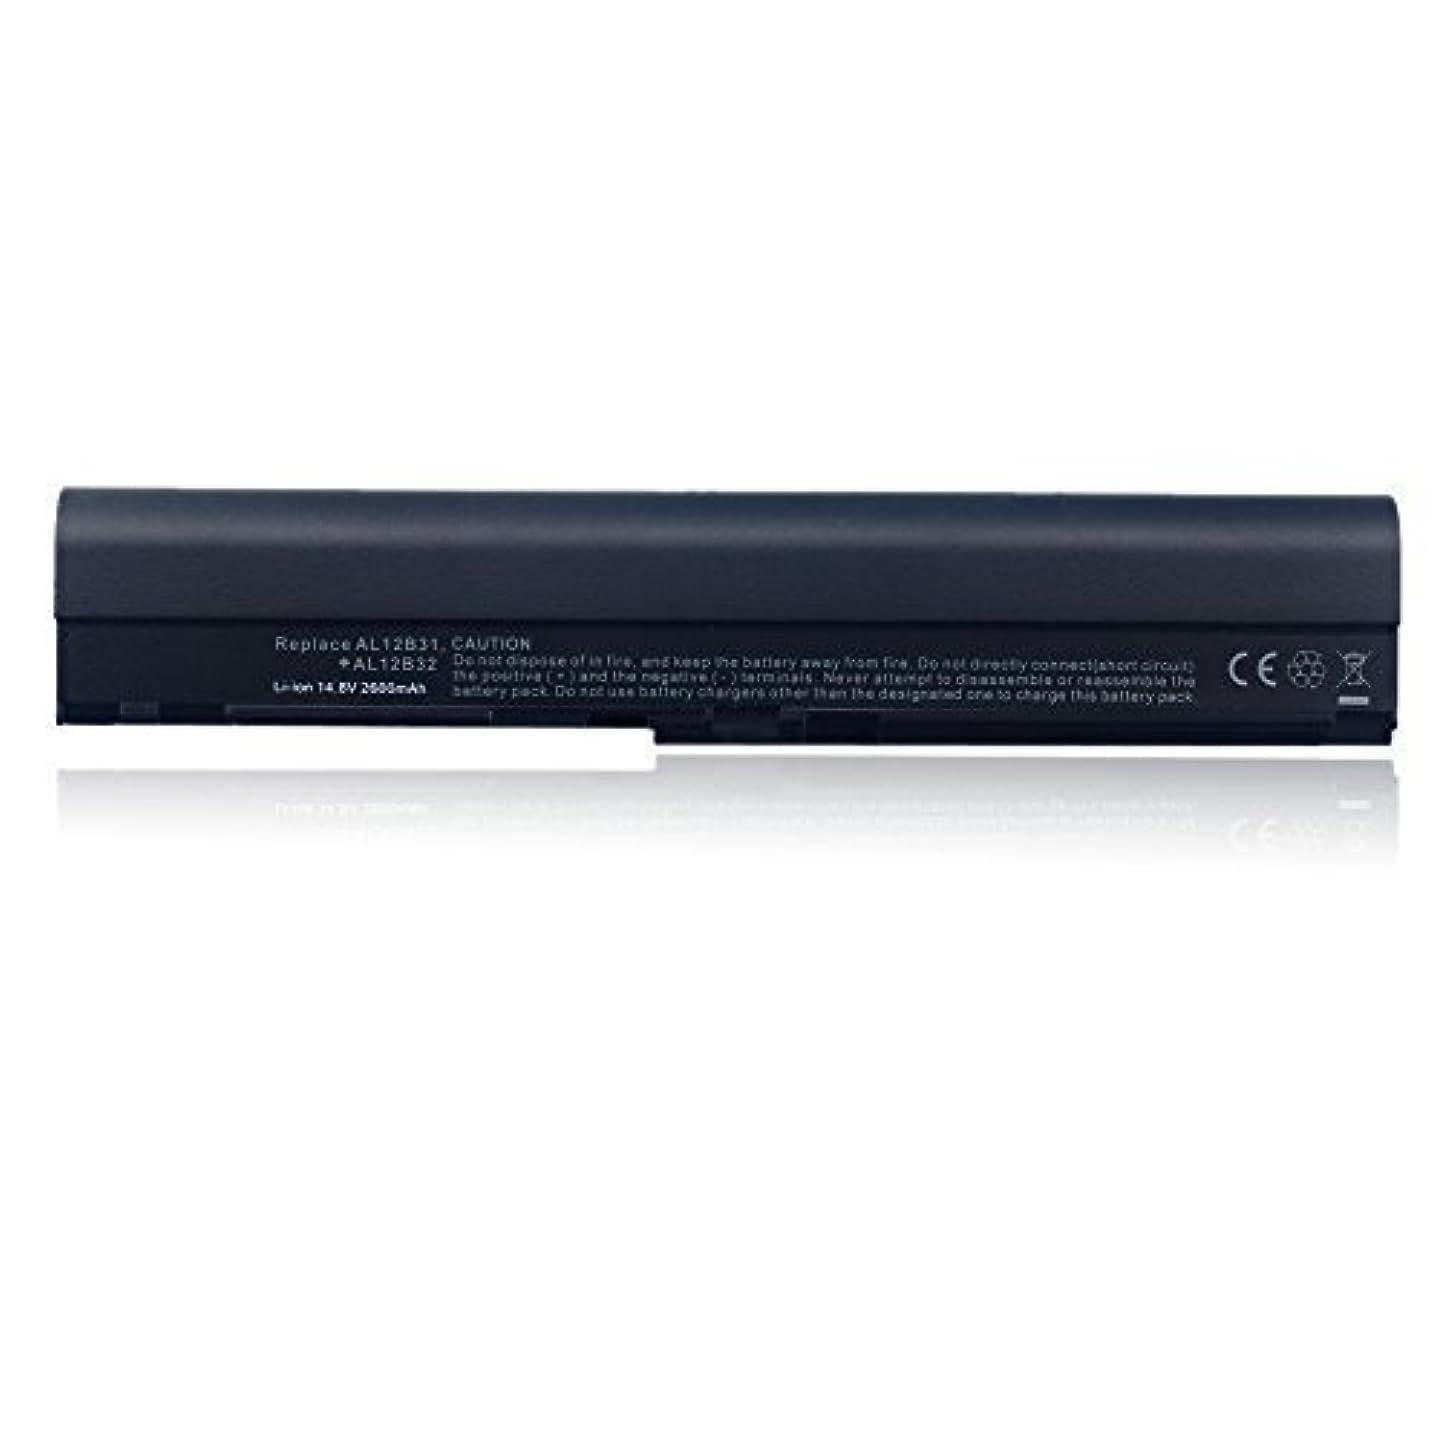 Bay Valley Parts Laptop Battery AL12B31 AL12B32 AL12B72 AL12X32 Li-Ion Battery 4-Cell Pack for Acer Aspire V5-171 Aspire One 725 756 TravelMate B113-E B113-M Laptop/Netbook